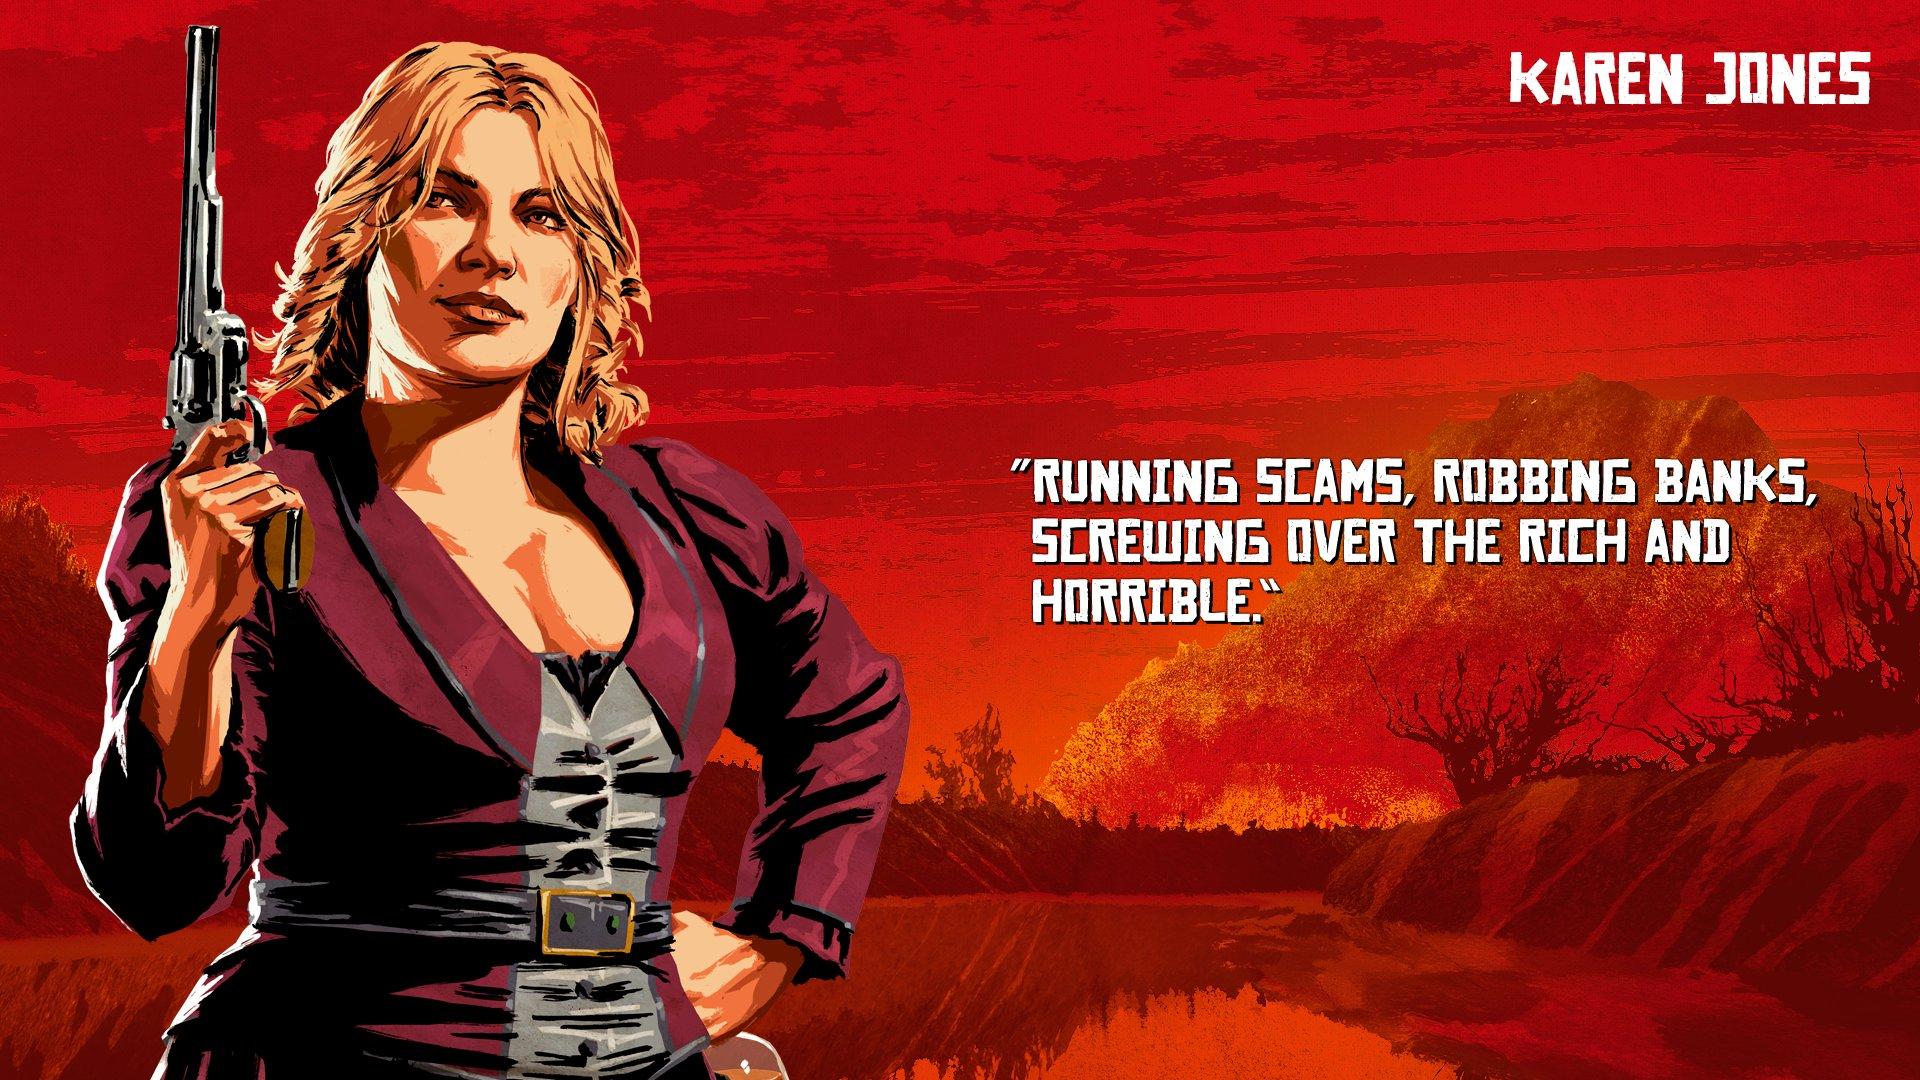 Rockstar Games revela artes dos personagens de Red Dead Redemption 2; veja 2